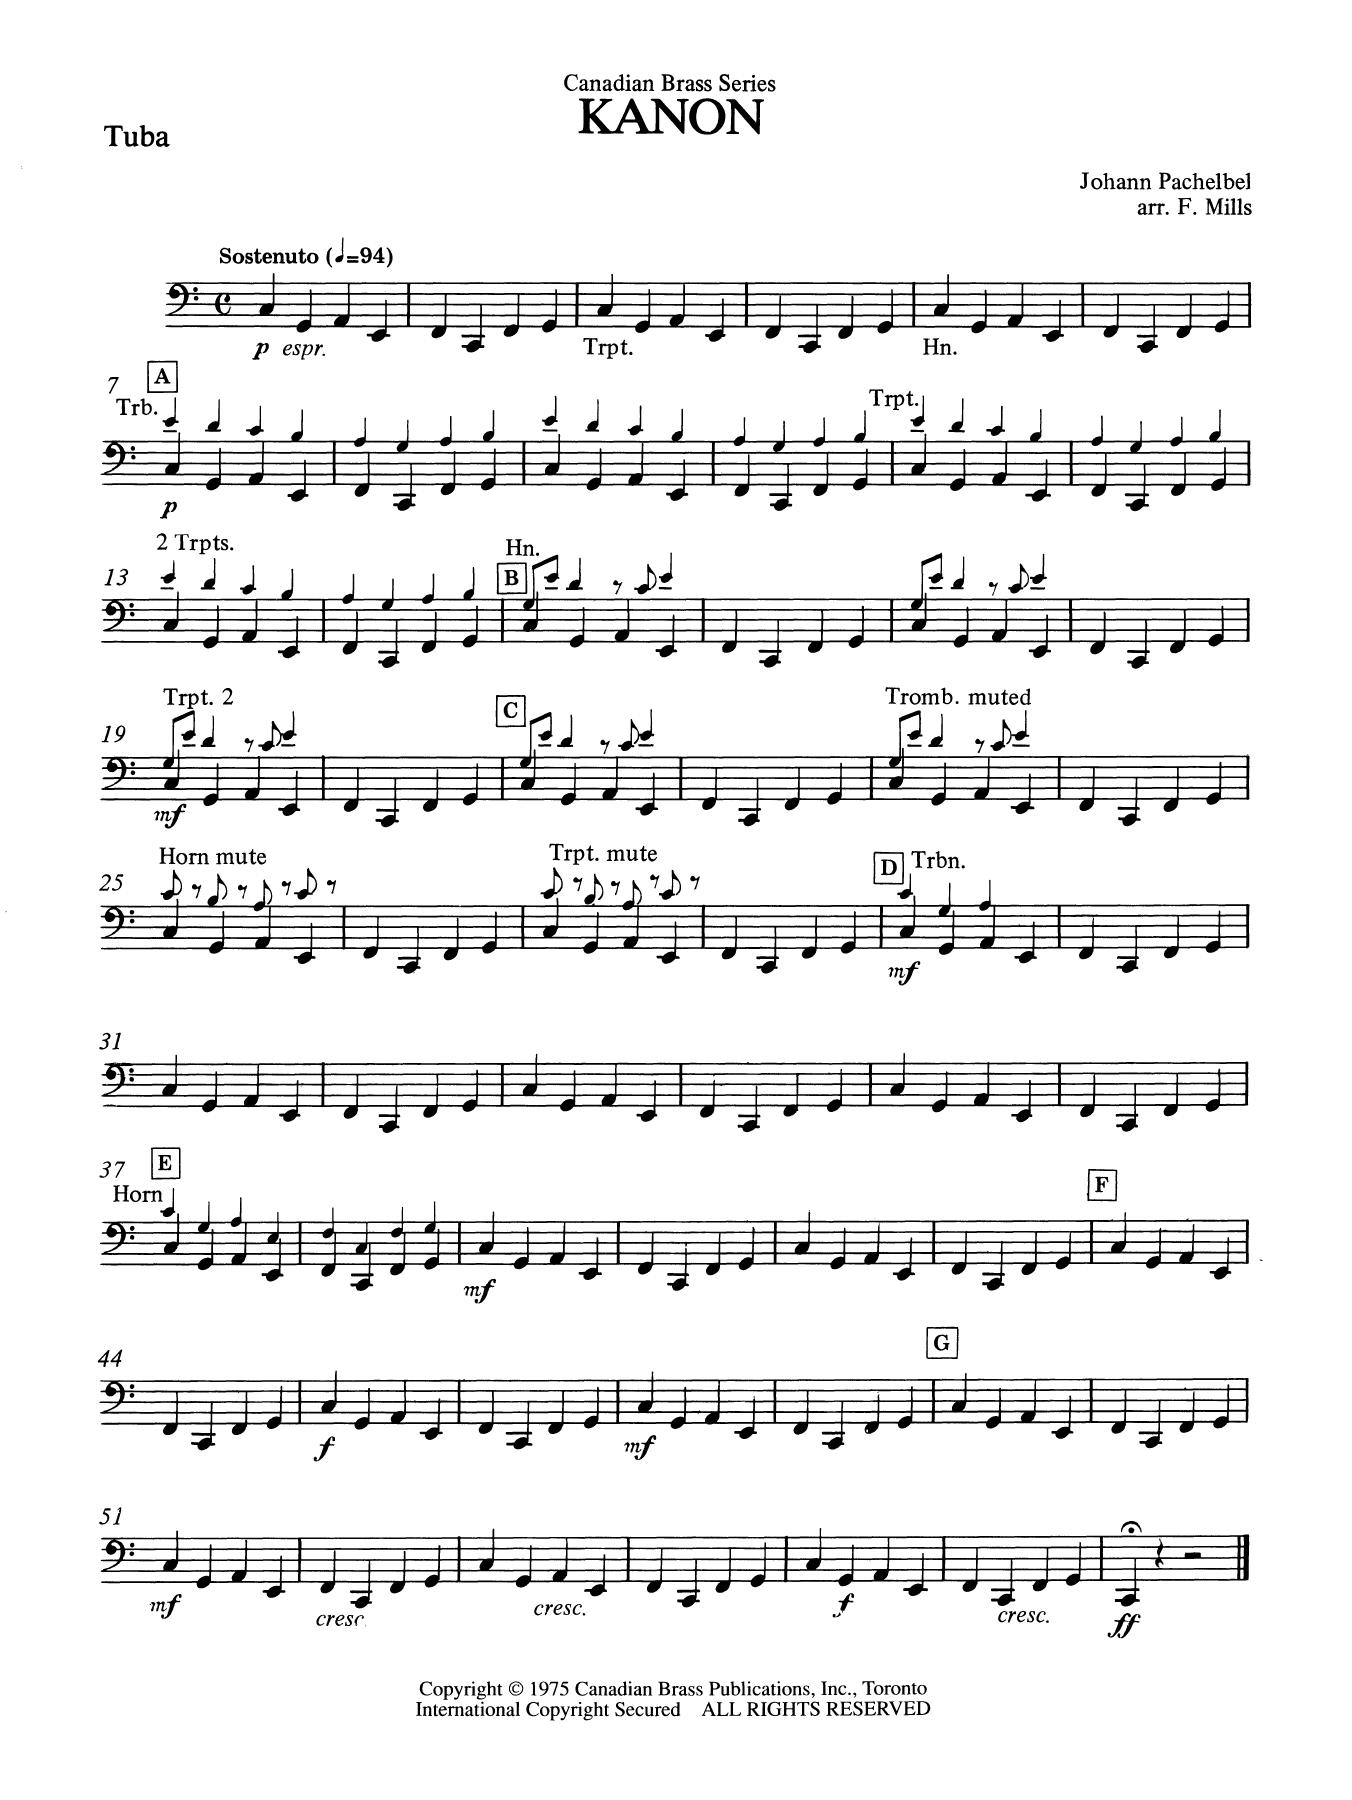 Kanon - Tuba Partition Digitale